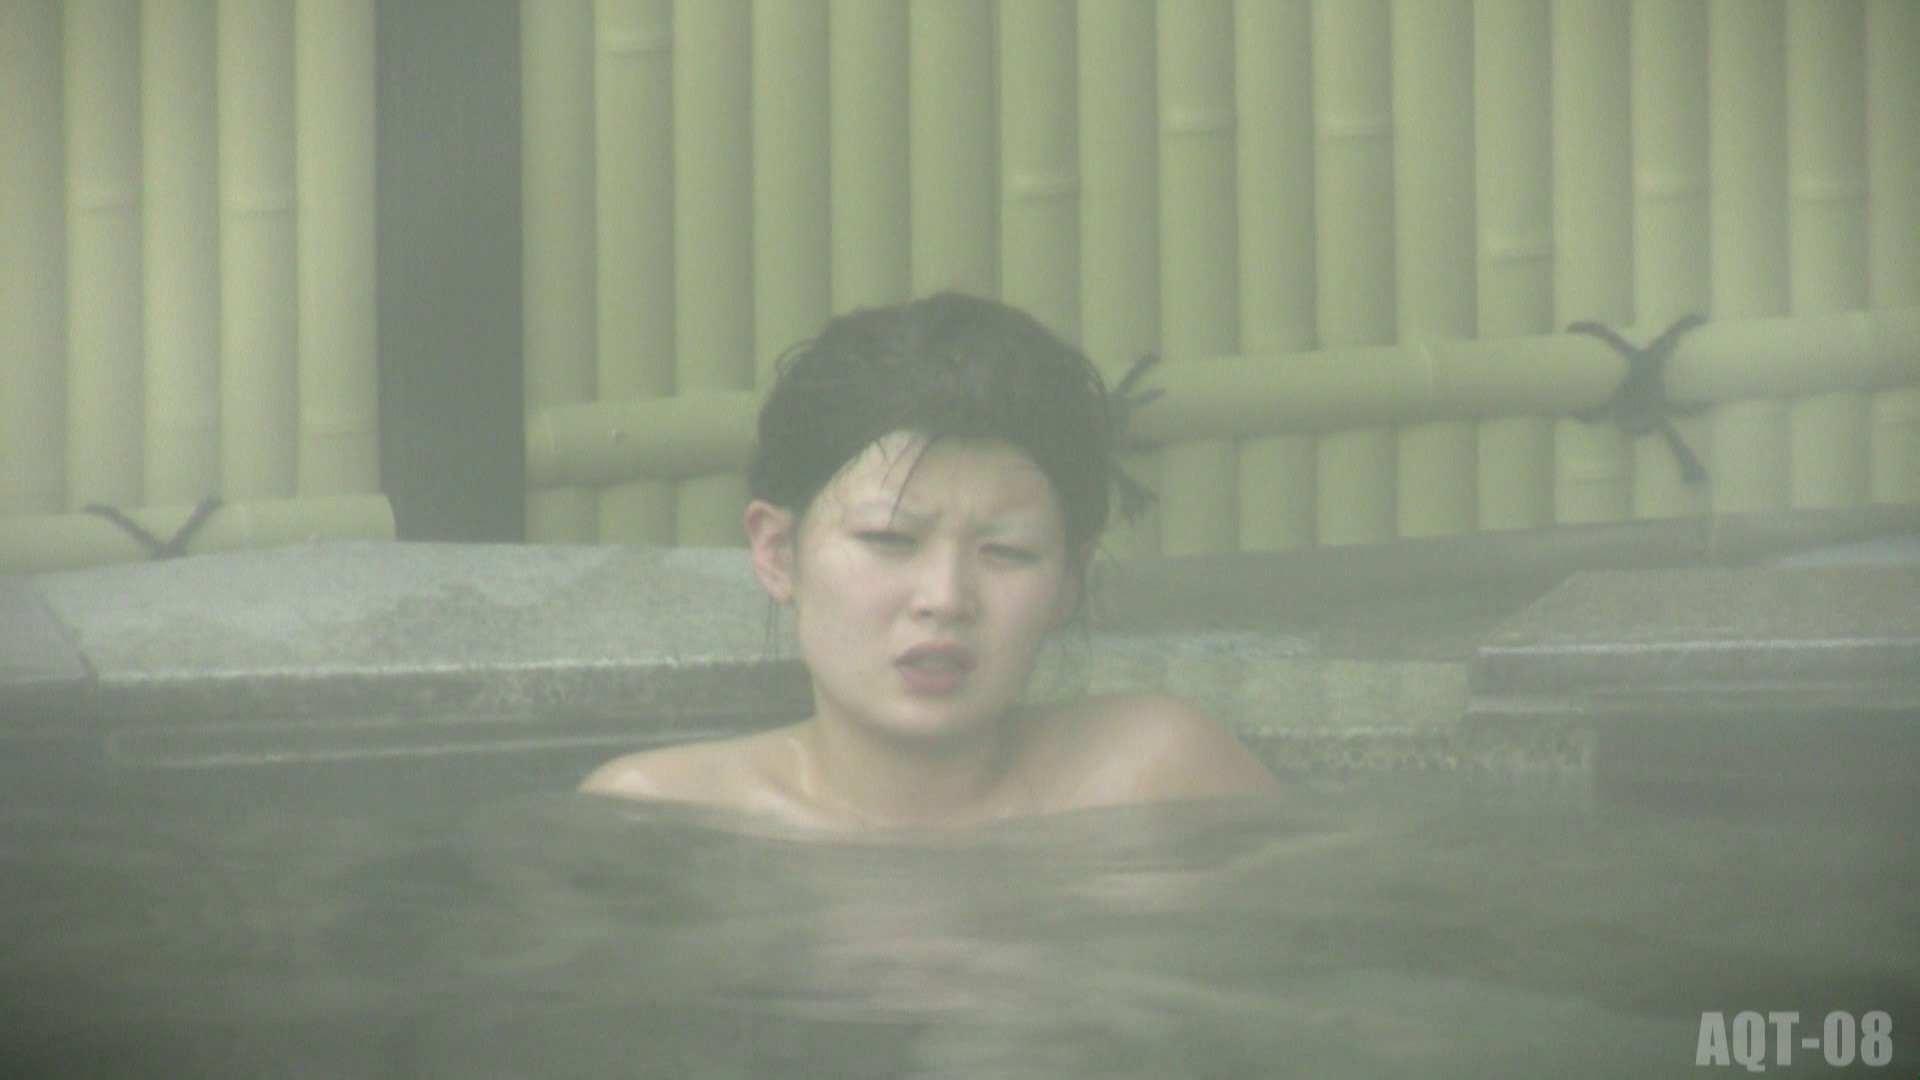 Aquaな露天風呂Vol.777 盗撮   OLエロ画像  78PICs 13